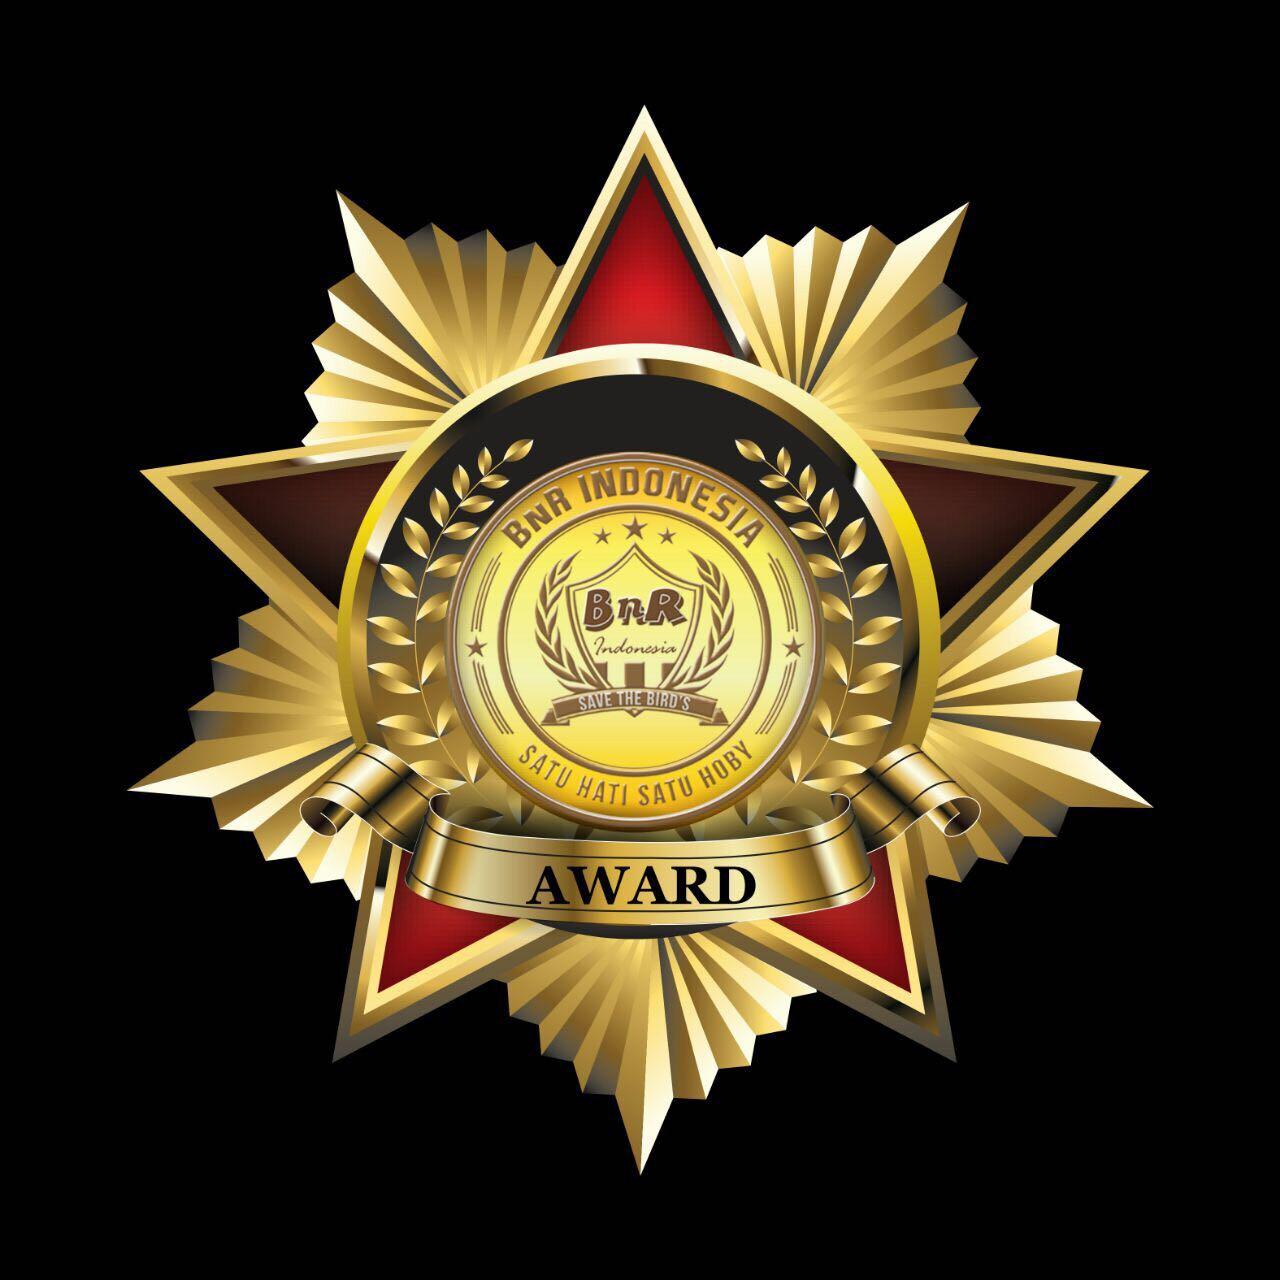 logo bnr award 2017